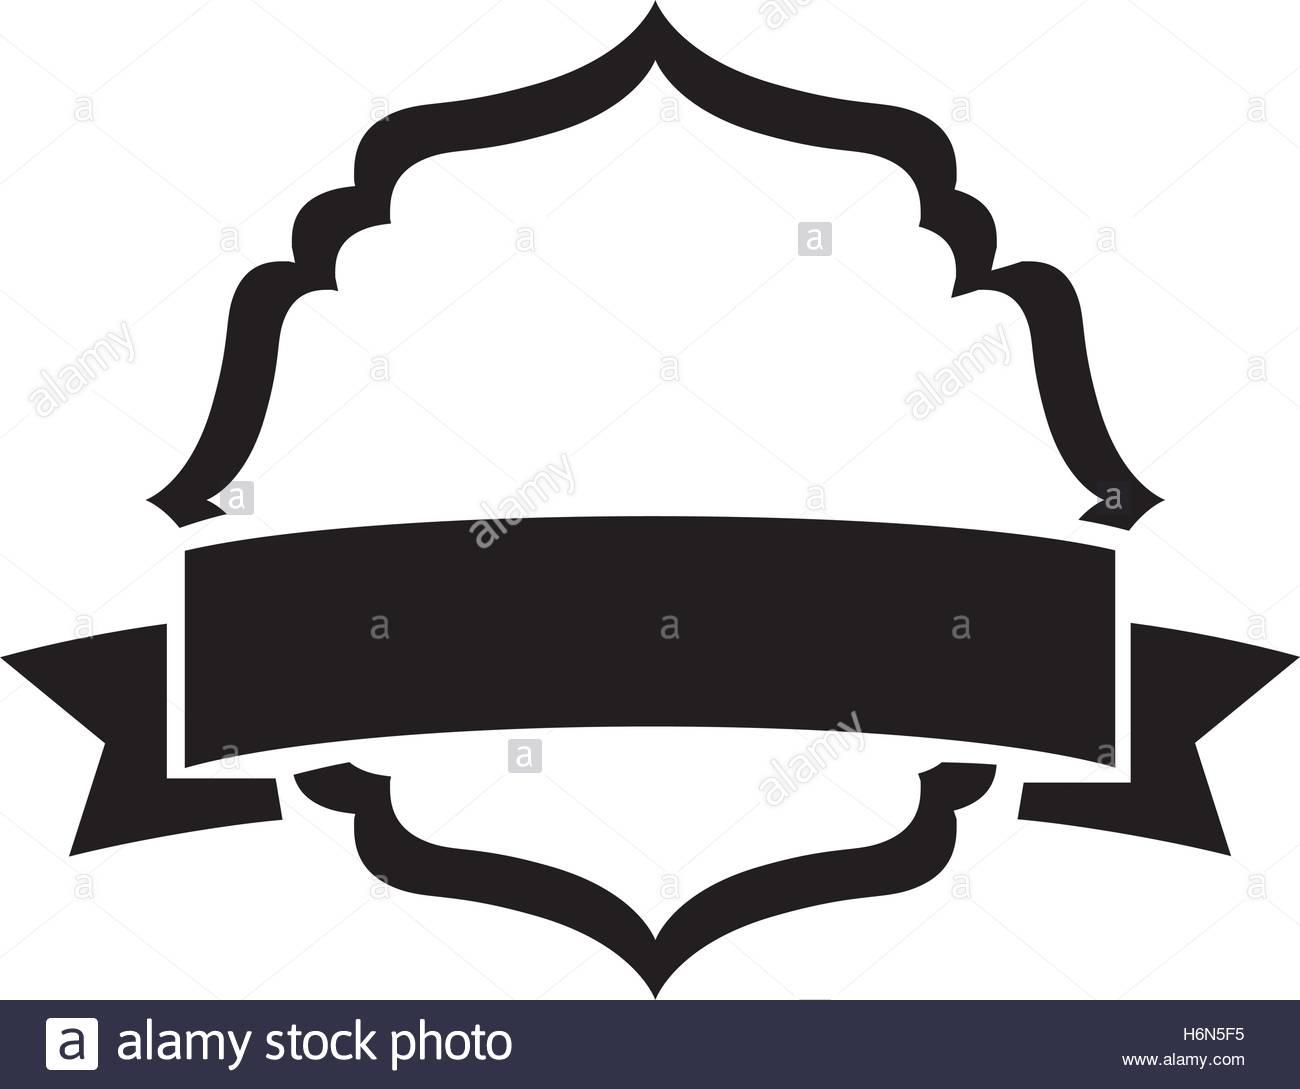 1300x1089 Black Silhouette Heraldic Decorative Frame With Label Vector Stock